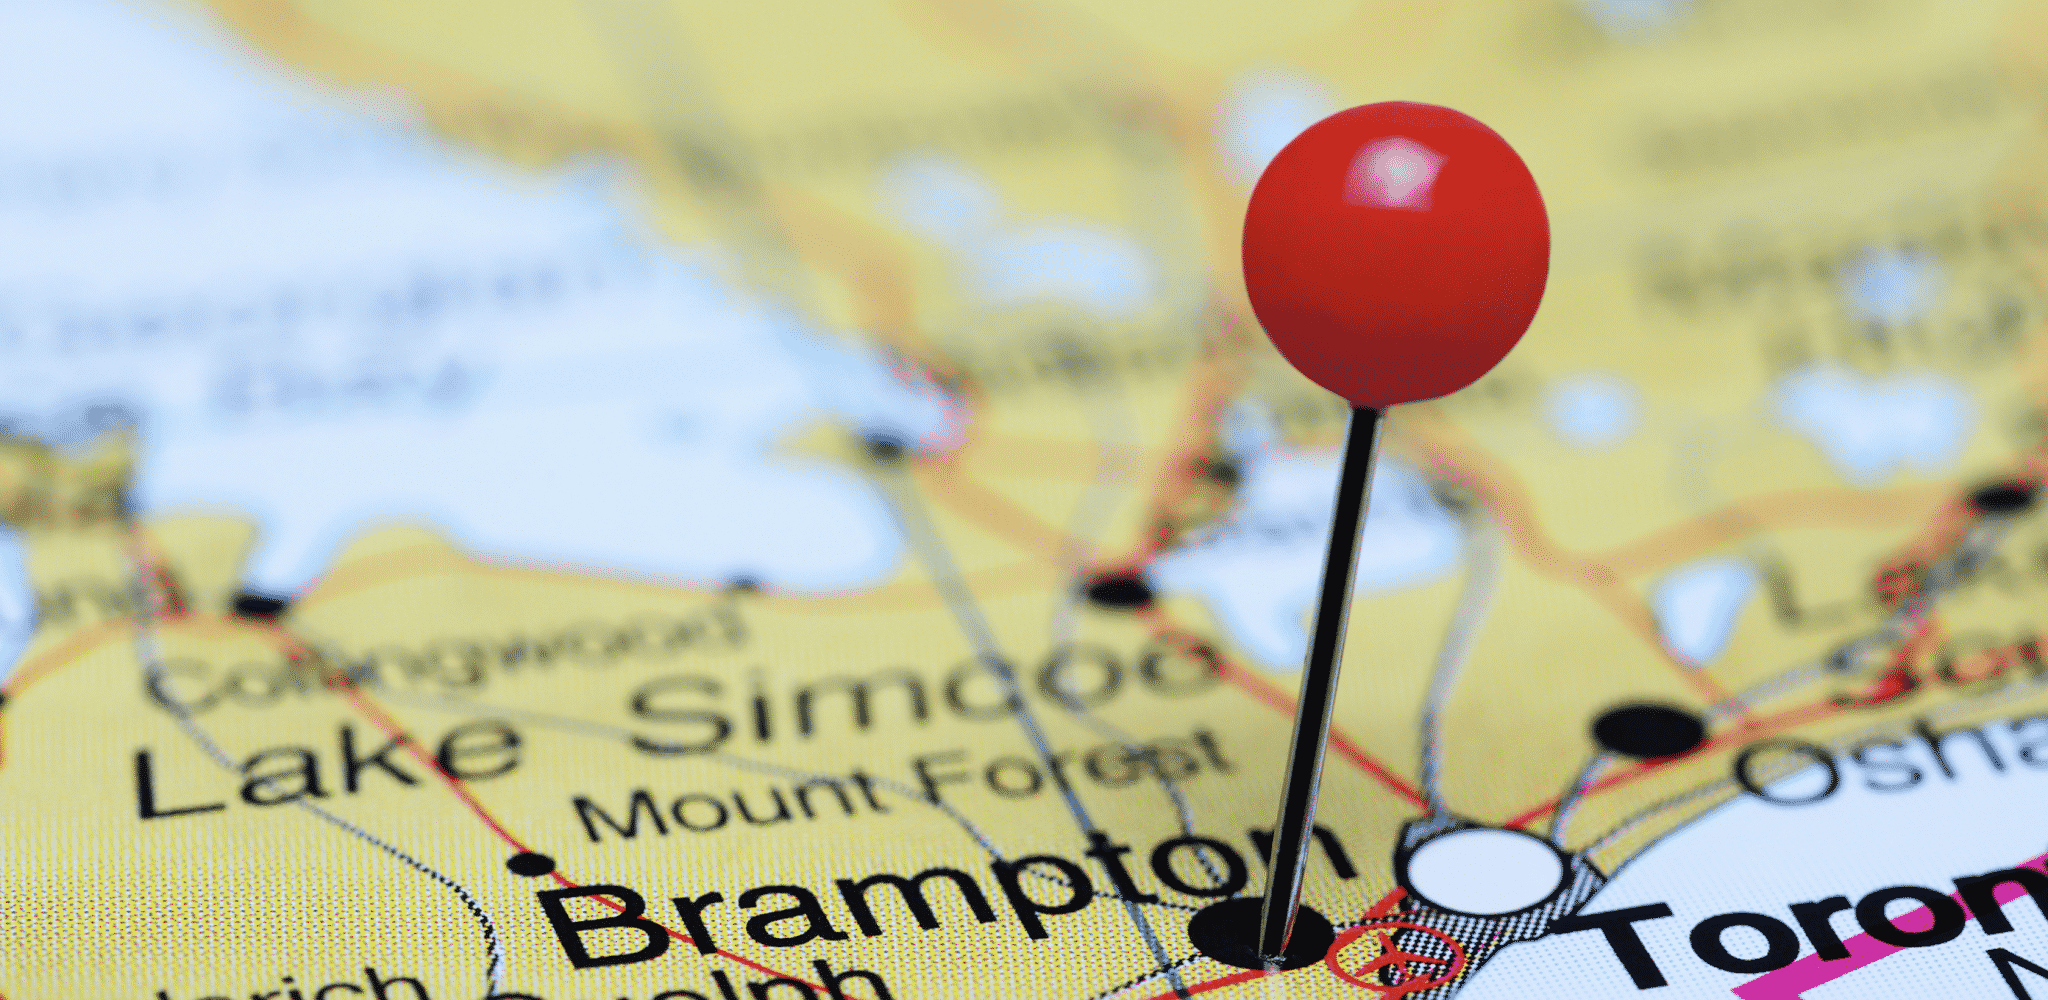 IT Services In Brampton